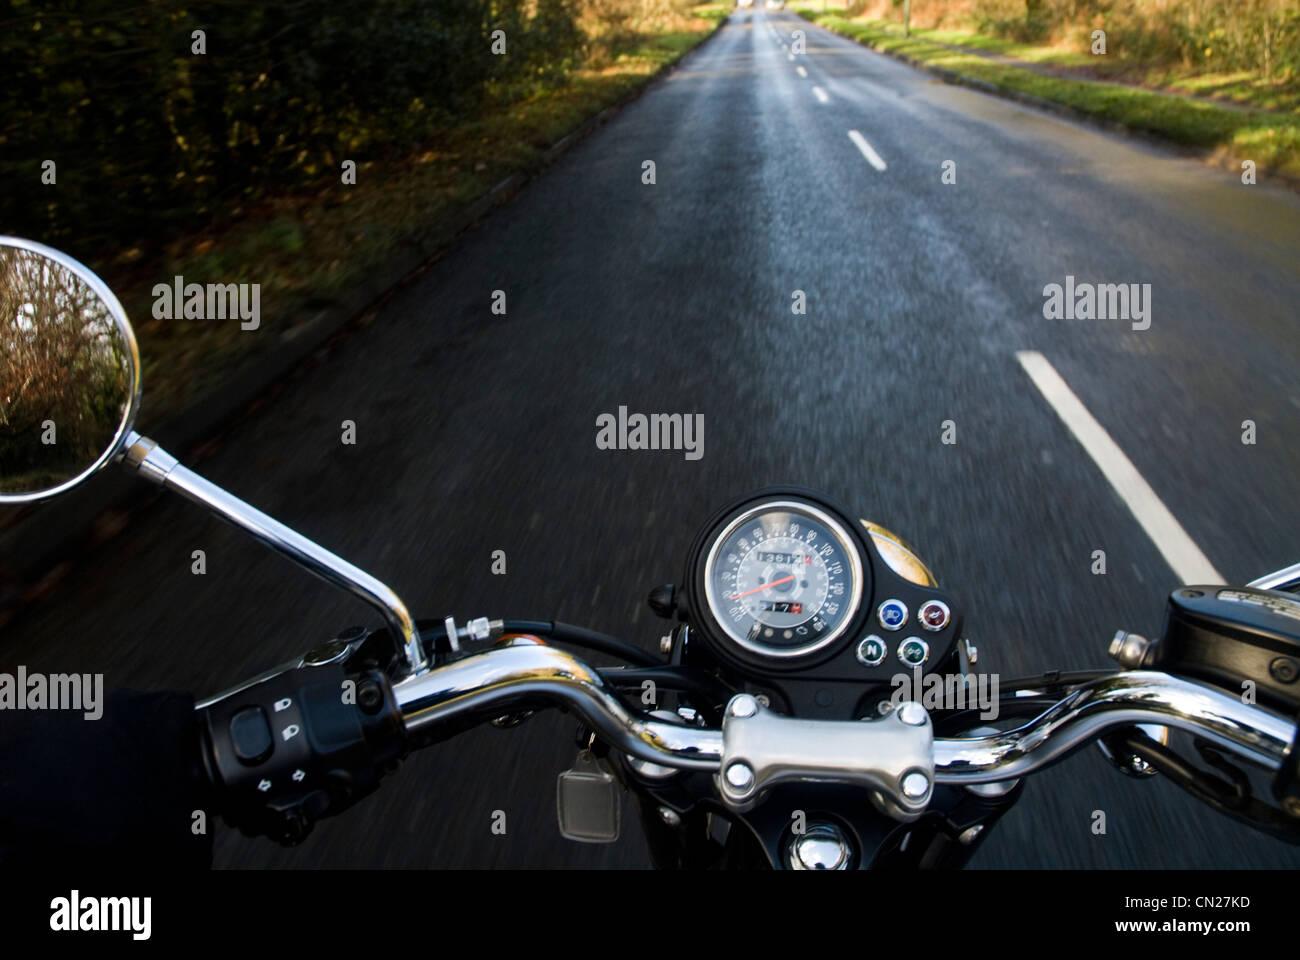 Motorbike on empty rural road - Stock Image